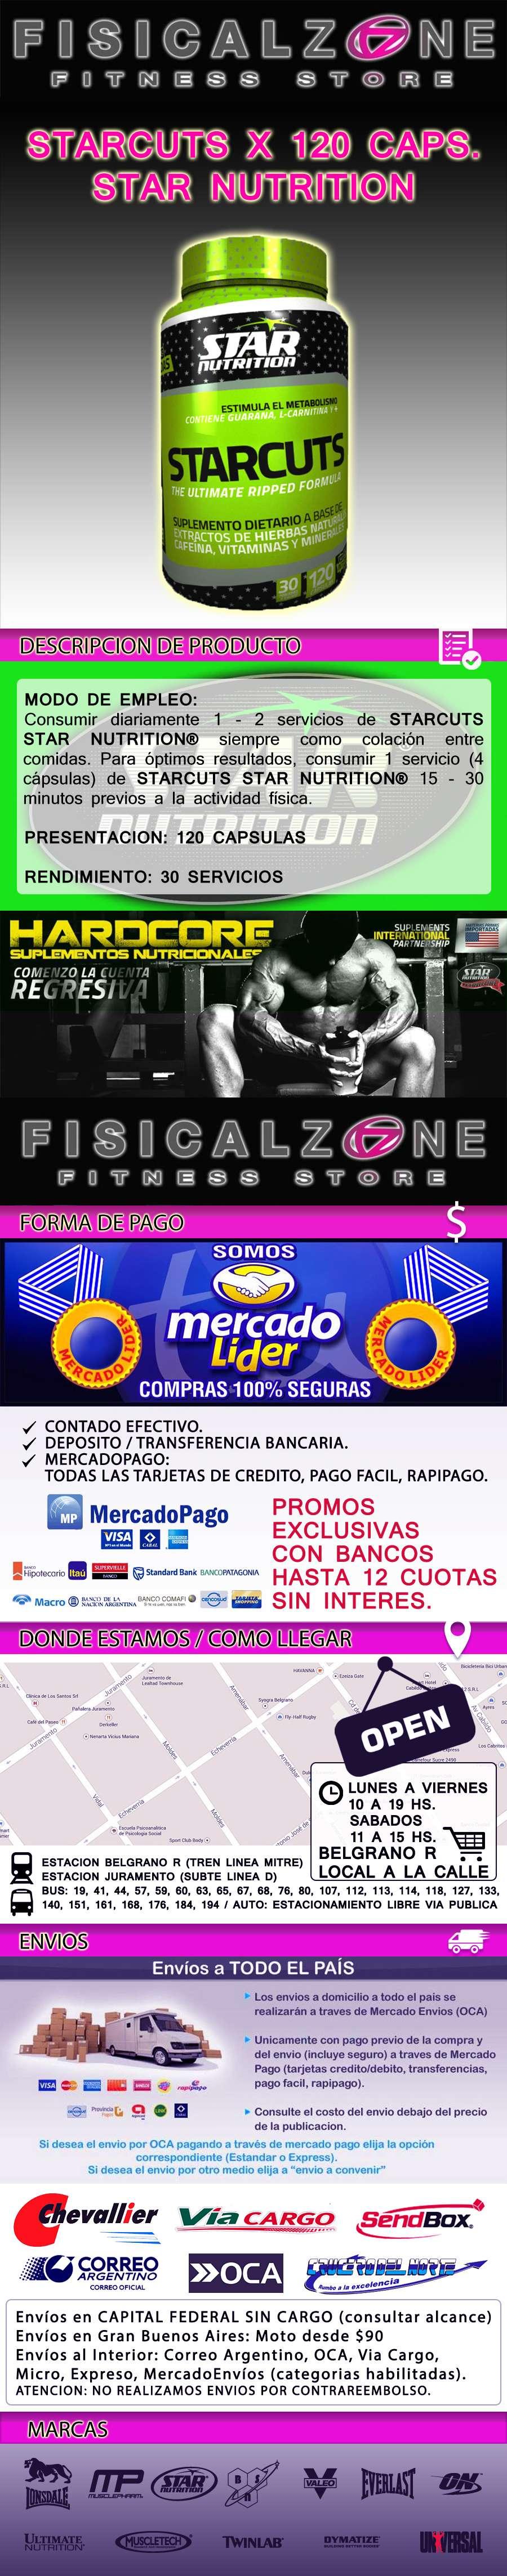 Plantilla ML Fisicalzone Fitness Store Belgrano